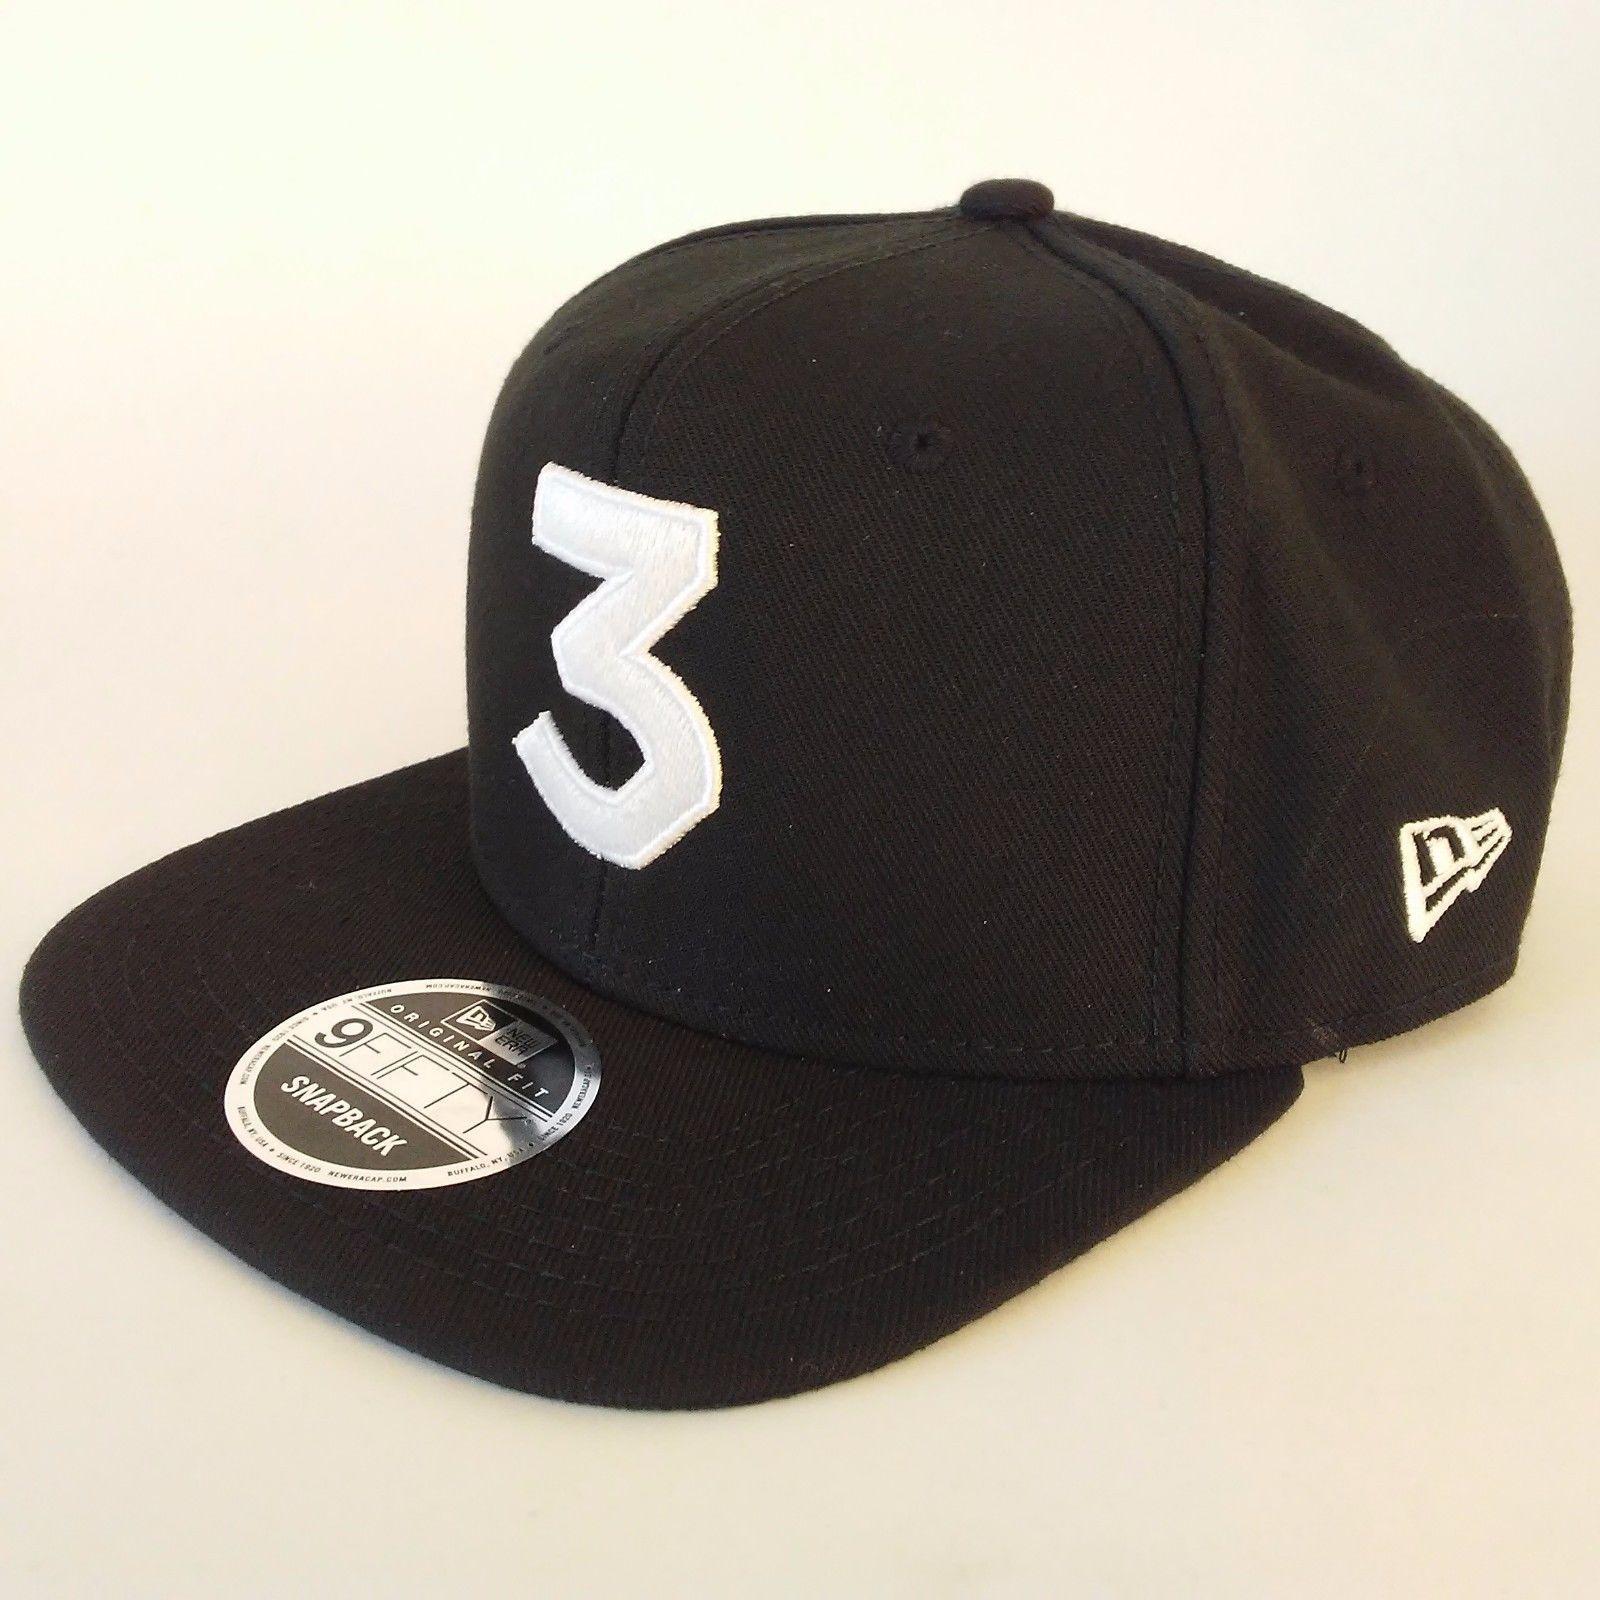 3 Chance The Rapper Black Genuine New Era and 50 similar items. S l1600 7 e0a05bcf120